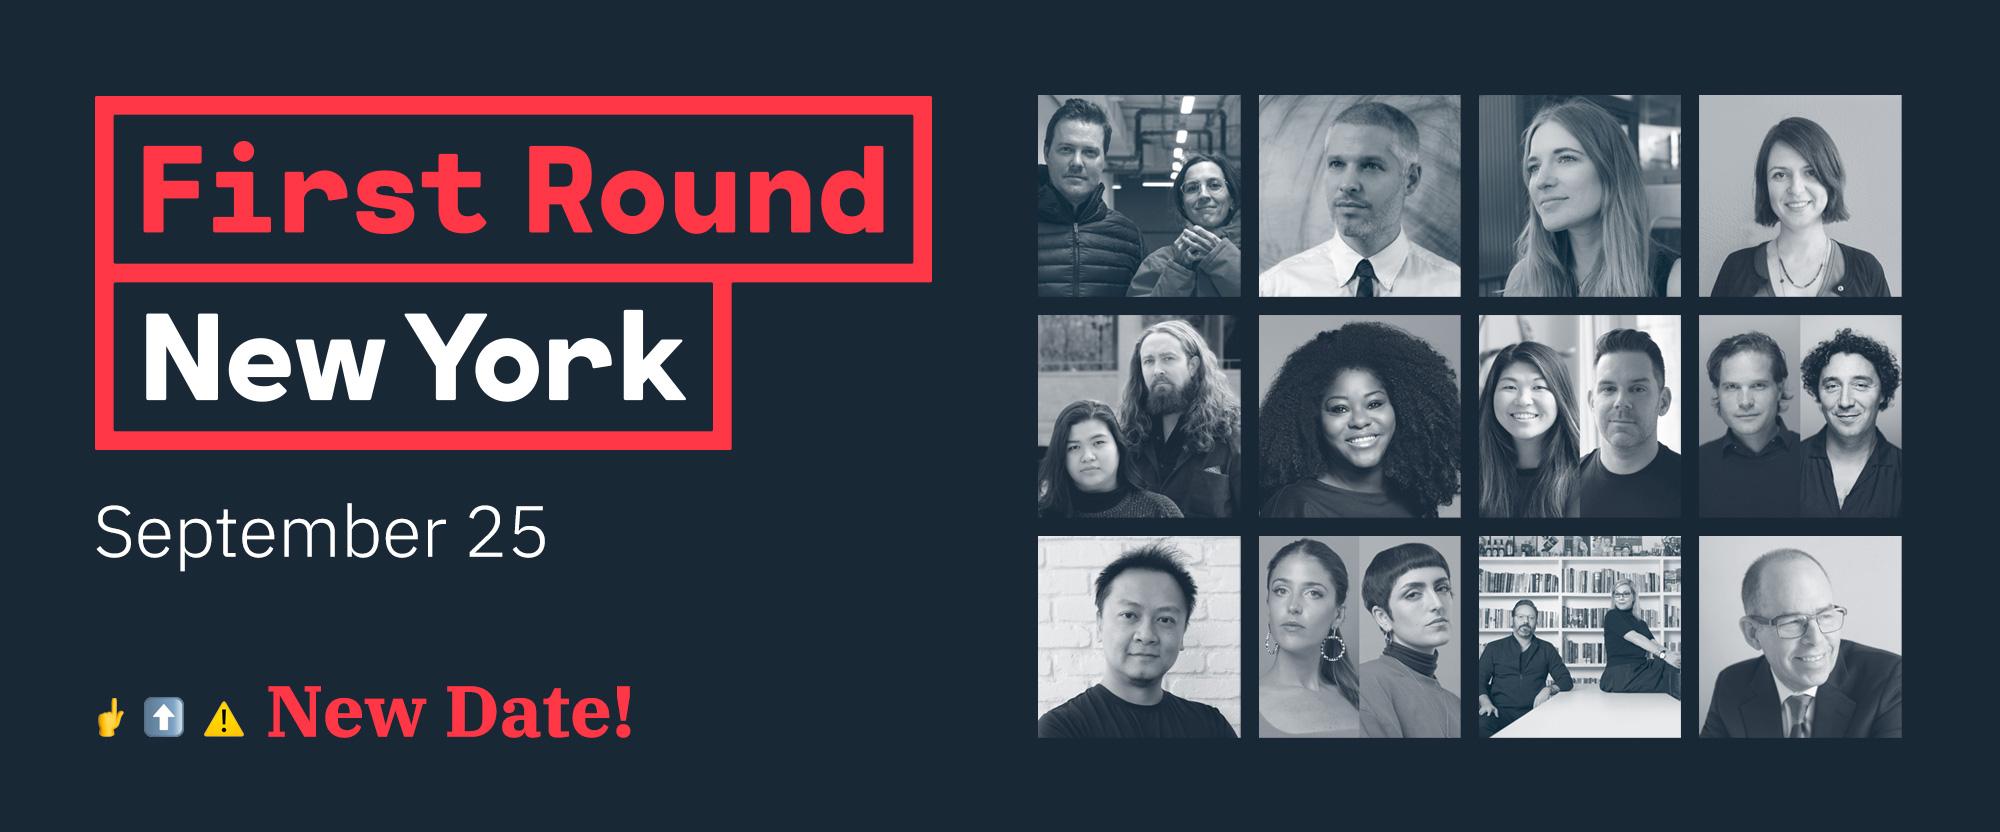 First Round 2020 – New York: Postponed